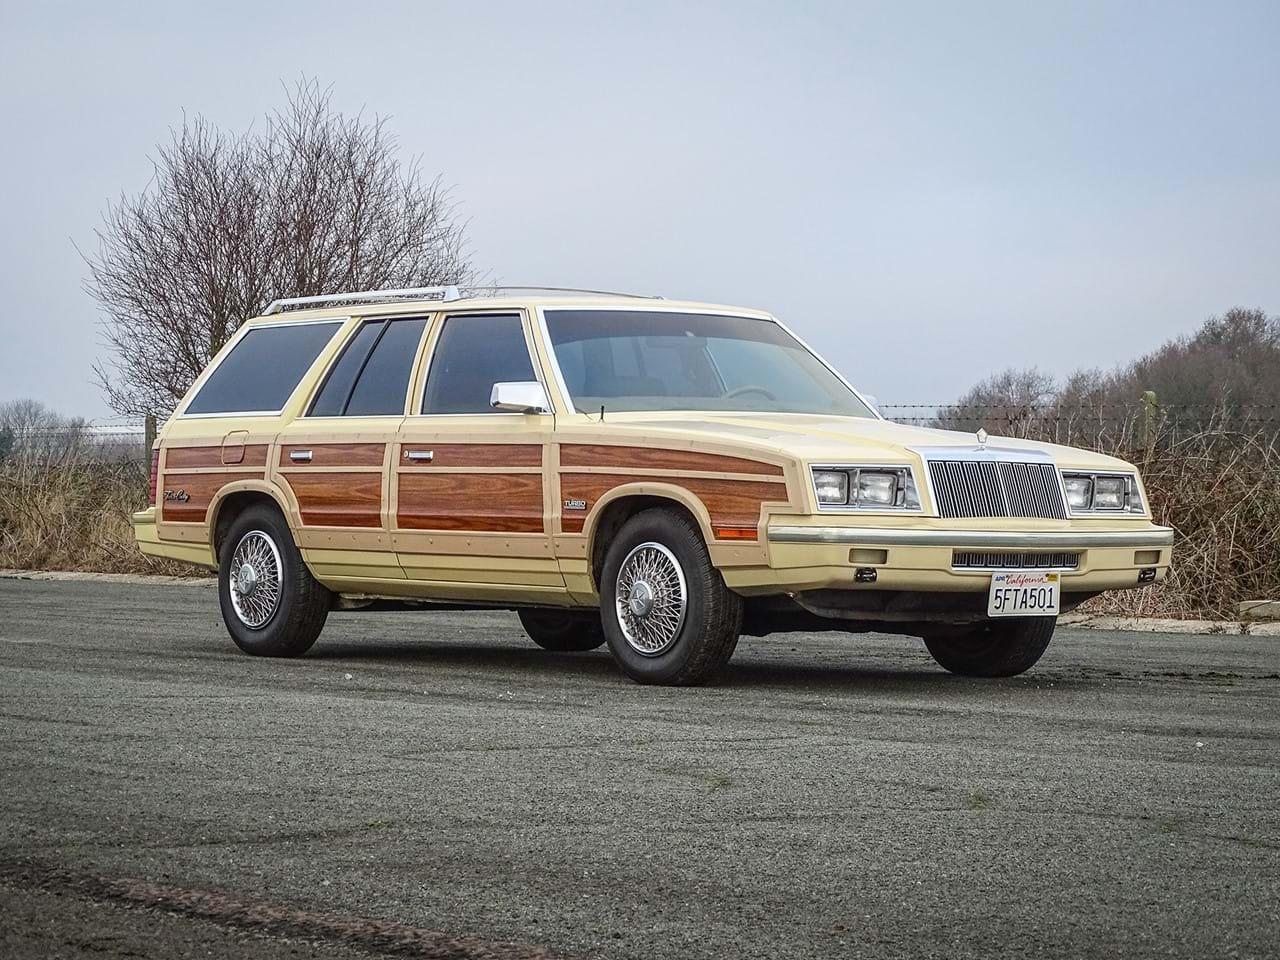 1985 Chrysler LeBaron Wagon, formly Frank Sinatra's, up for sale thumbnail